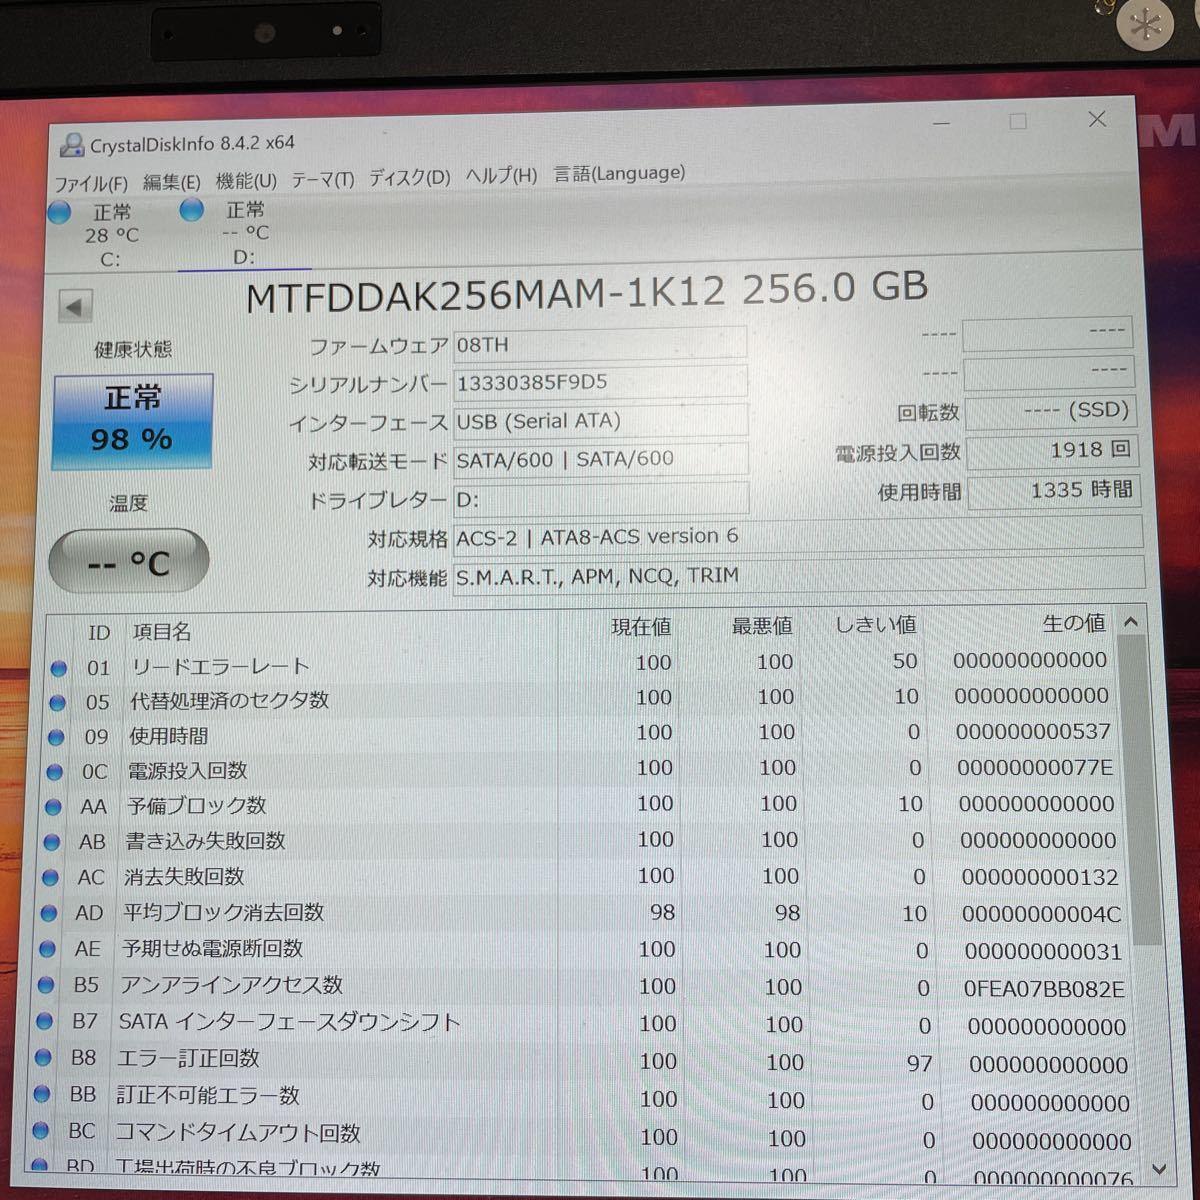 Micron SSD 2.5インチSATA 256GB使用時間1335h